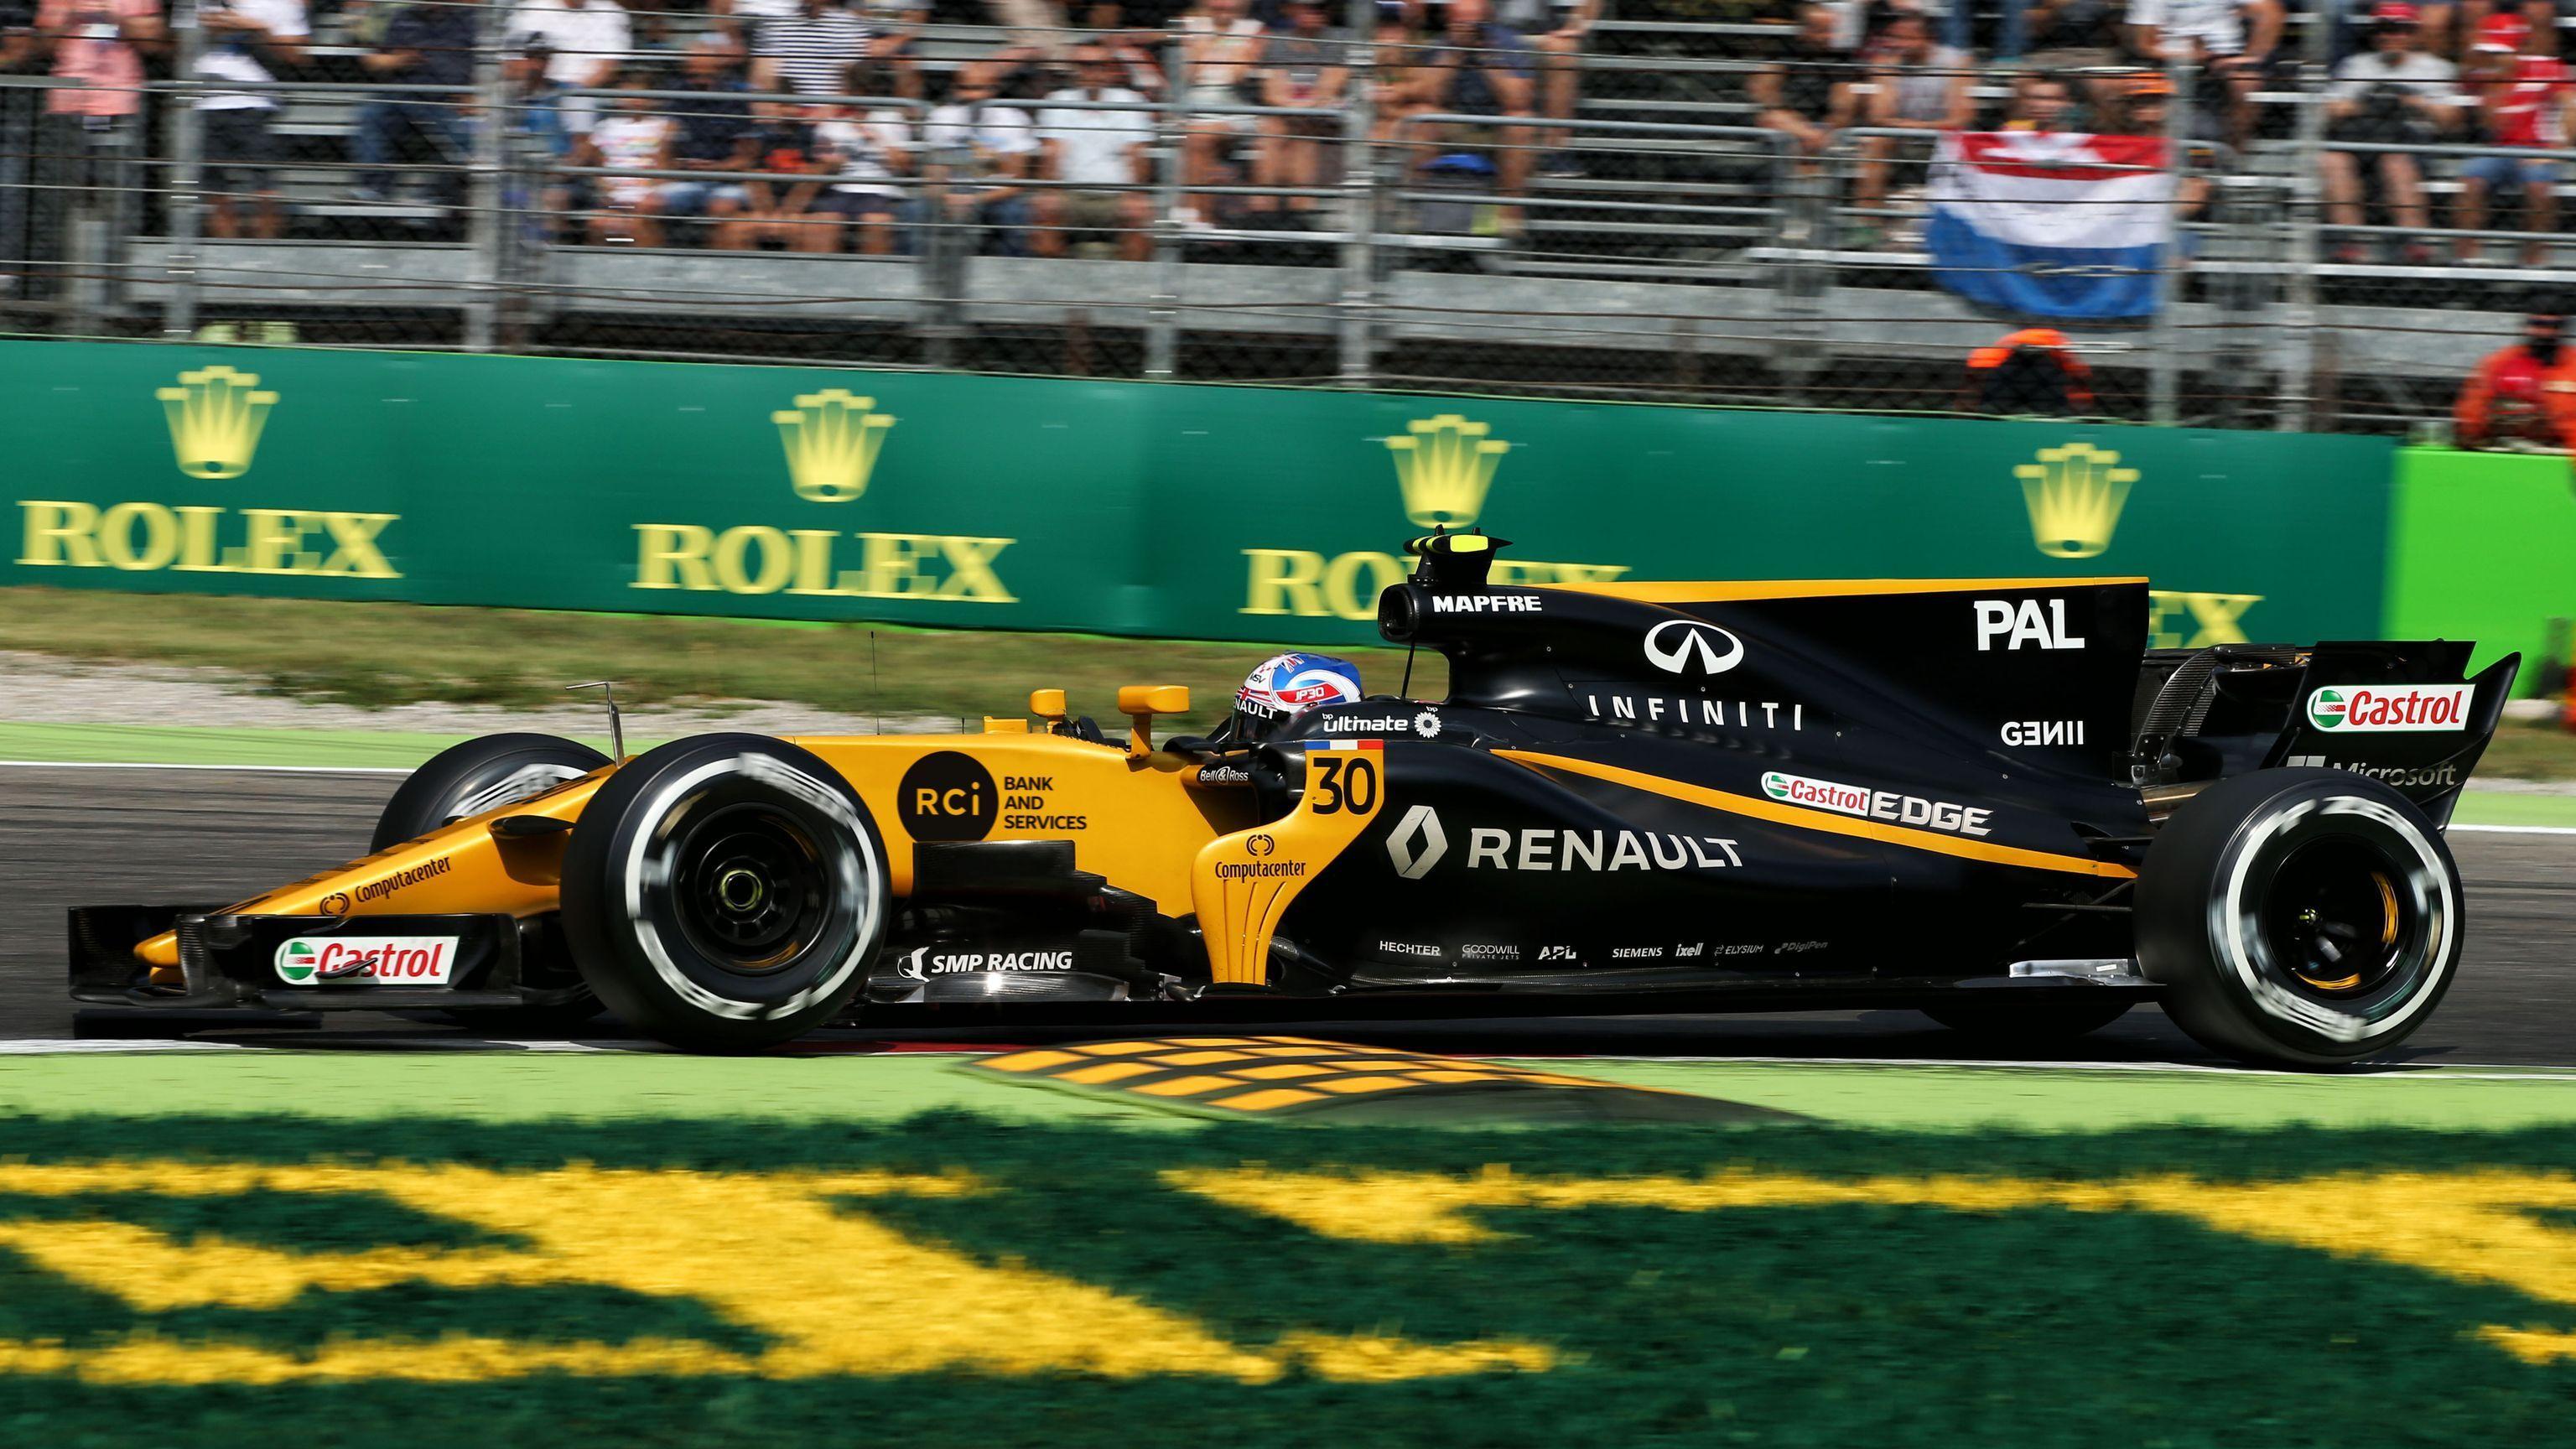 Команда Renault Sport Формула-1 оголосила про початок партнерства з RCI bank and Services